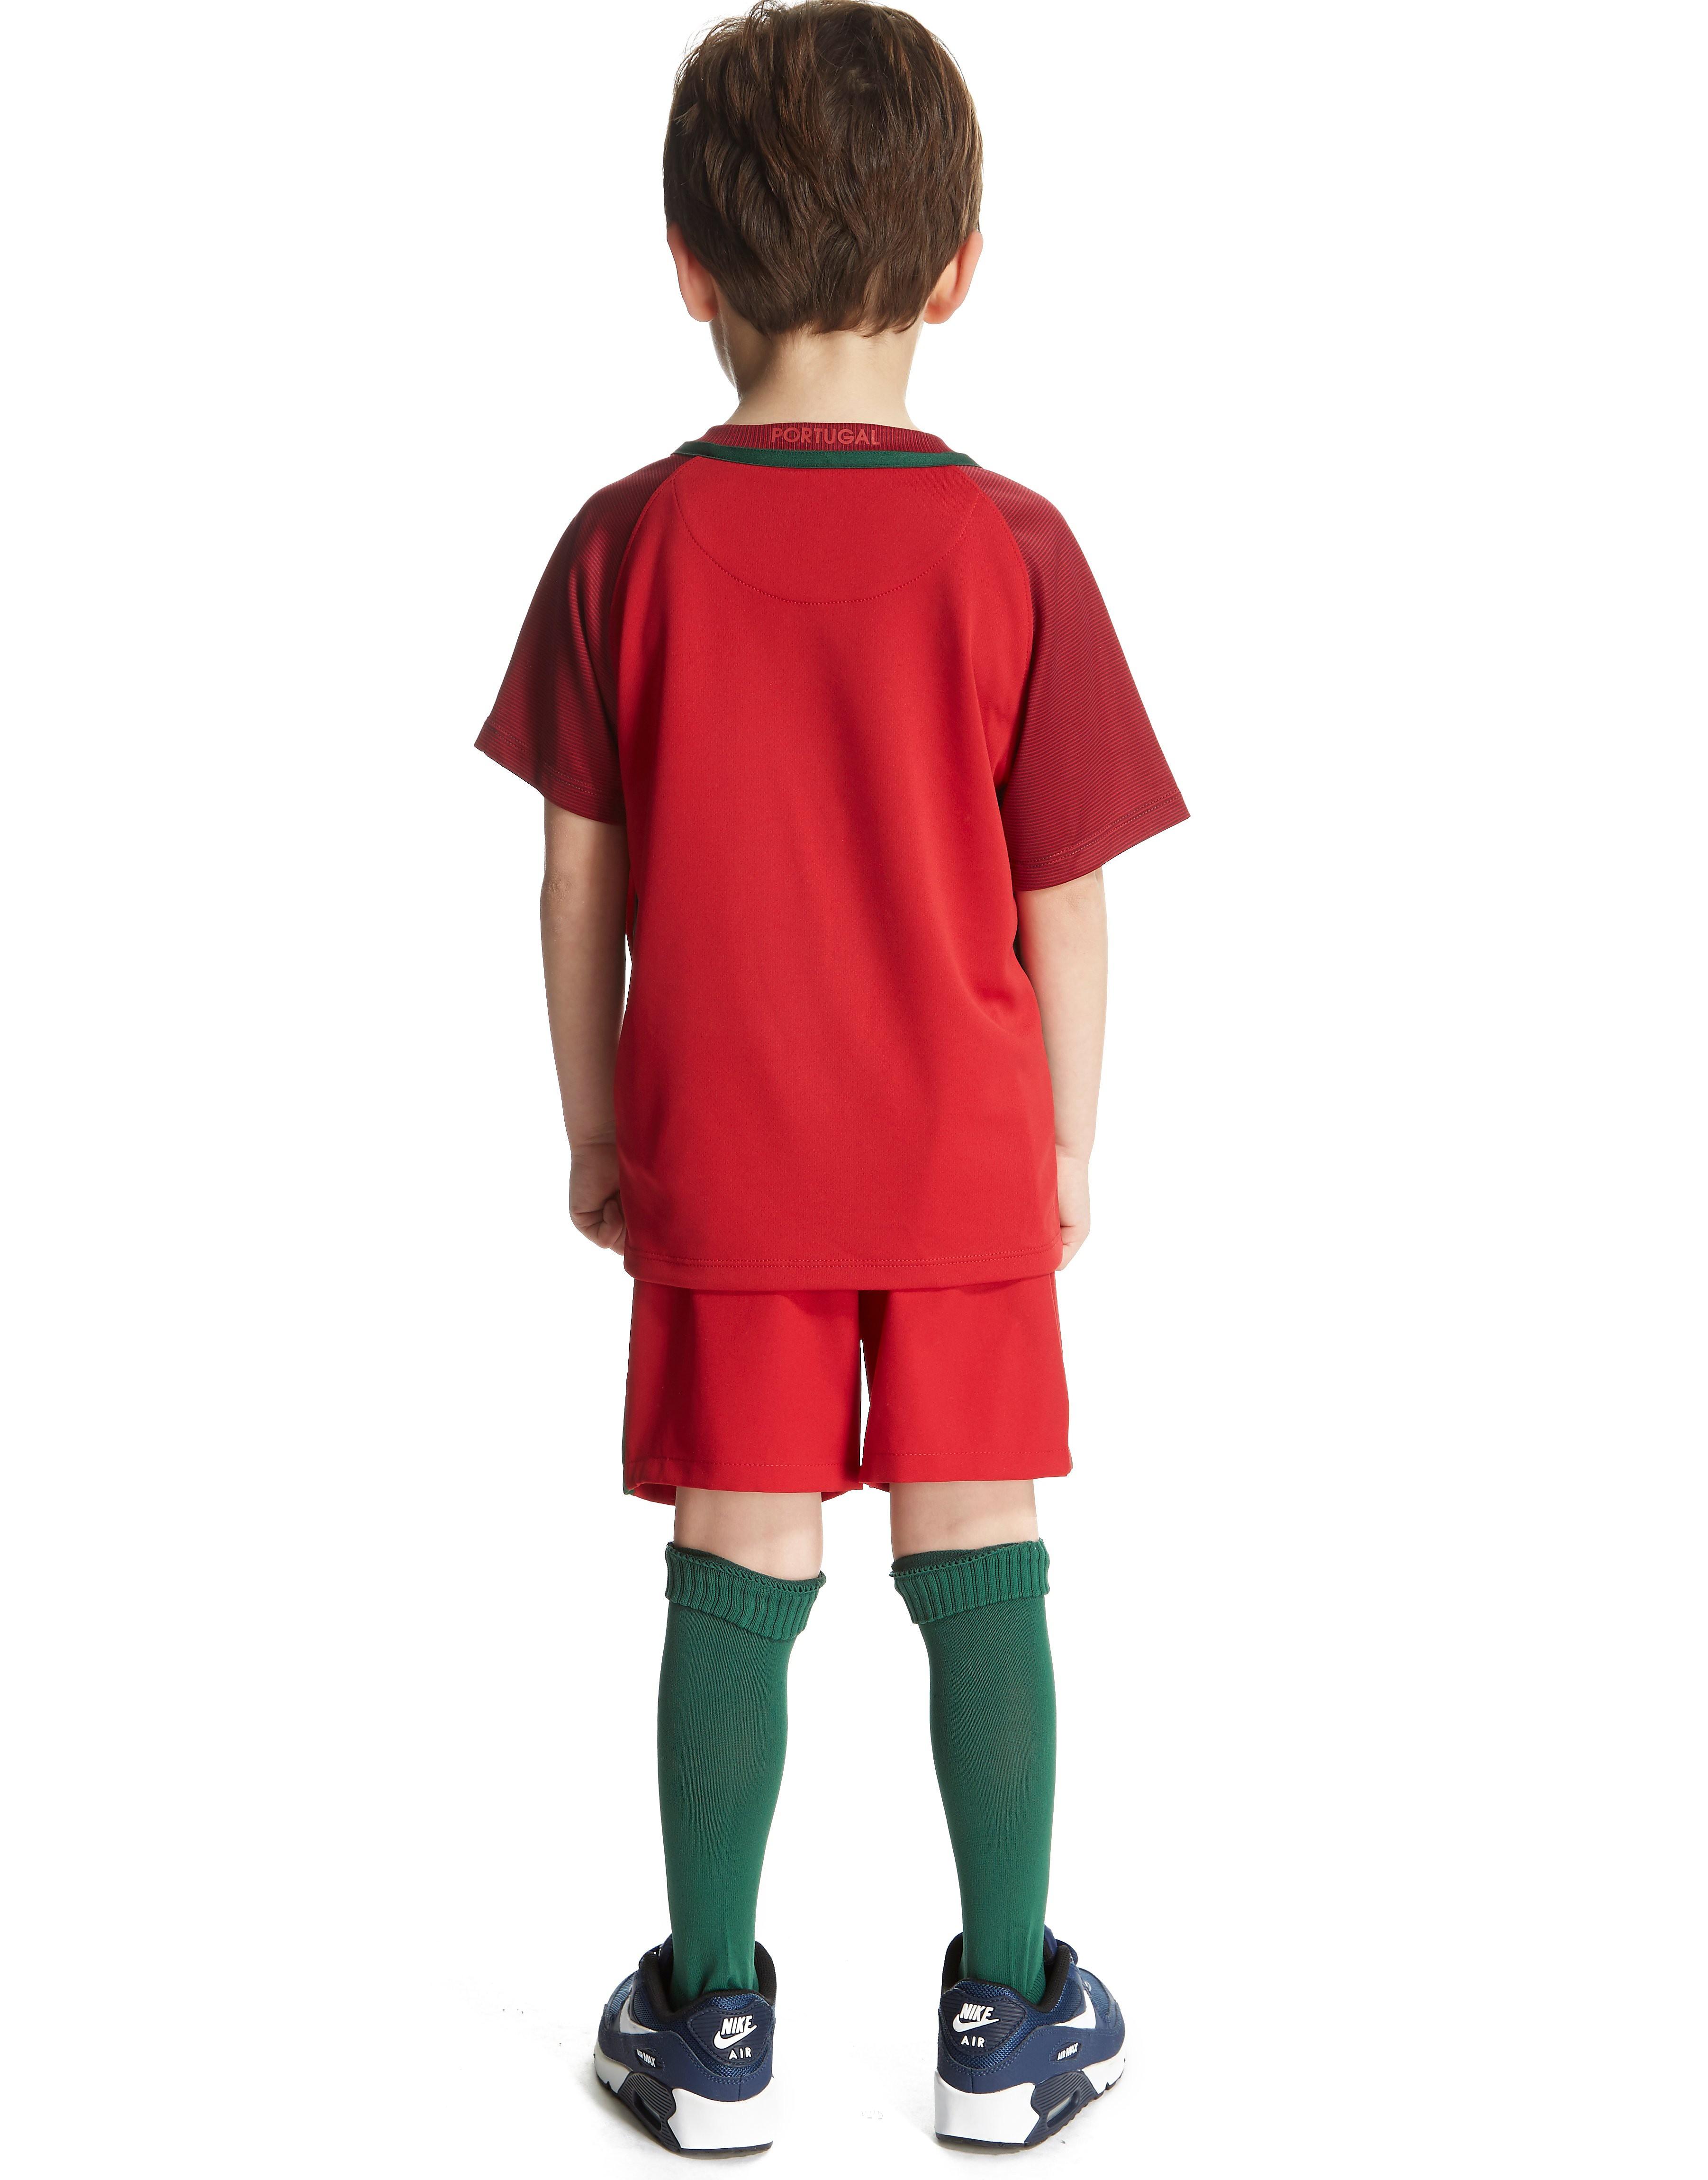 Nike Portugal Home 2016 Kit Children